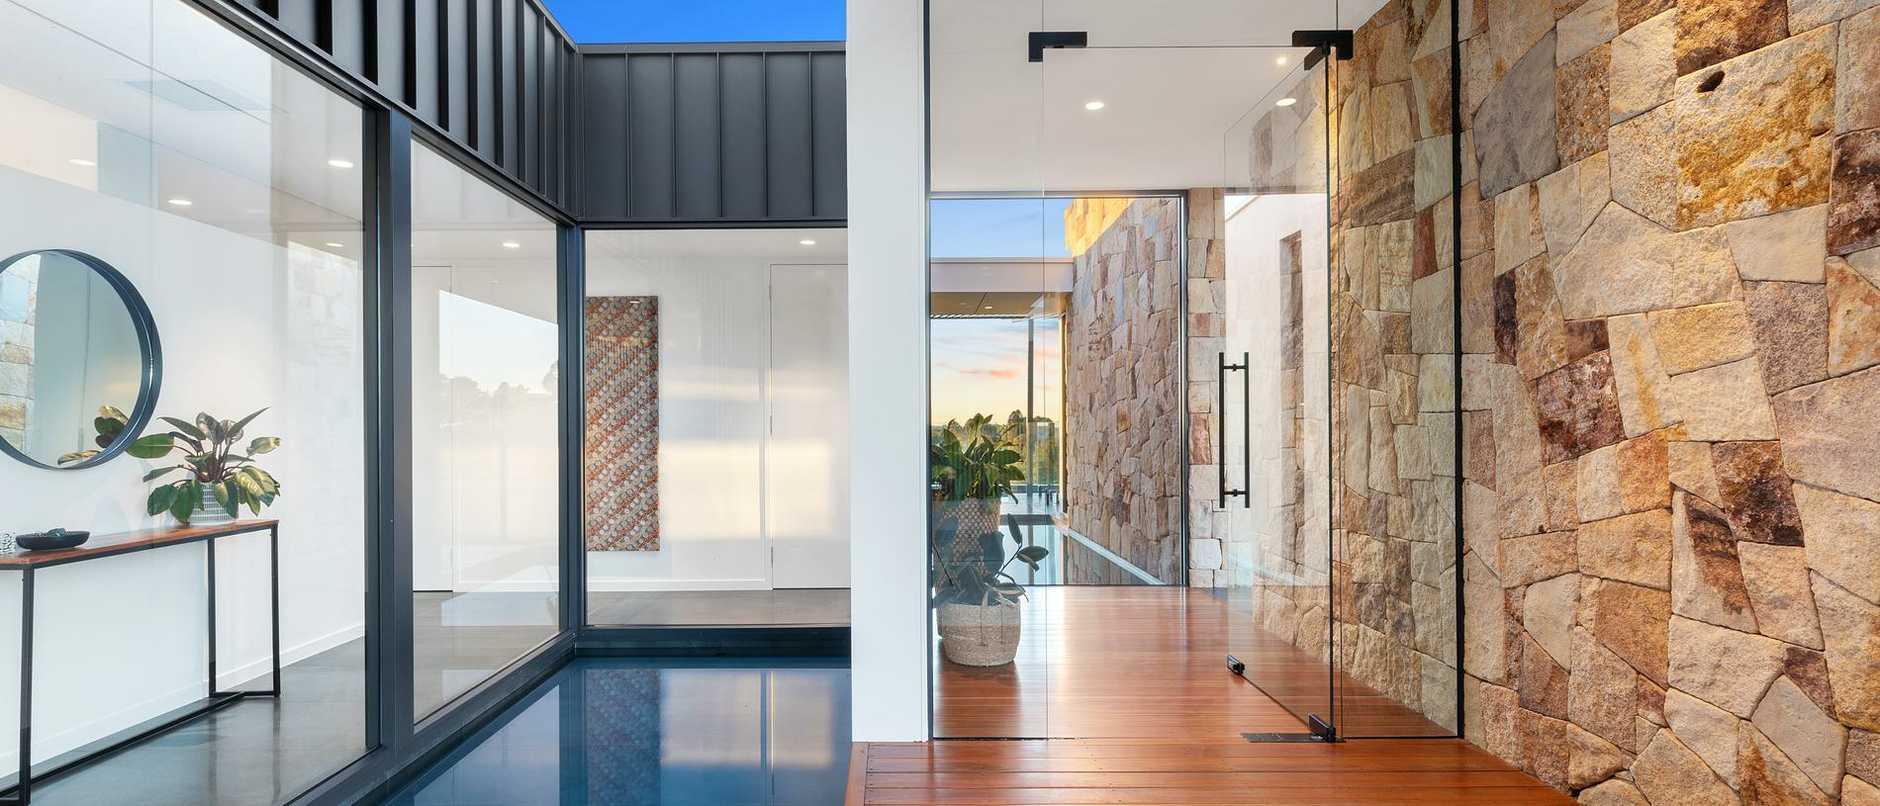 Stunning Pics Inside Coast S Best New Homes Sunshine Coast Daily